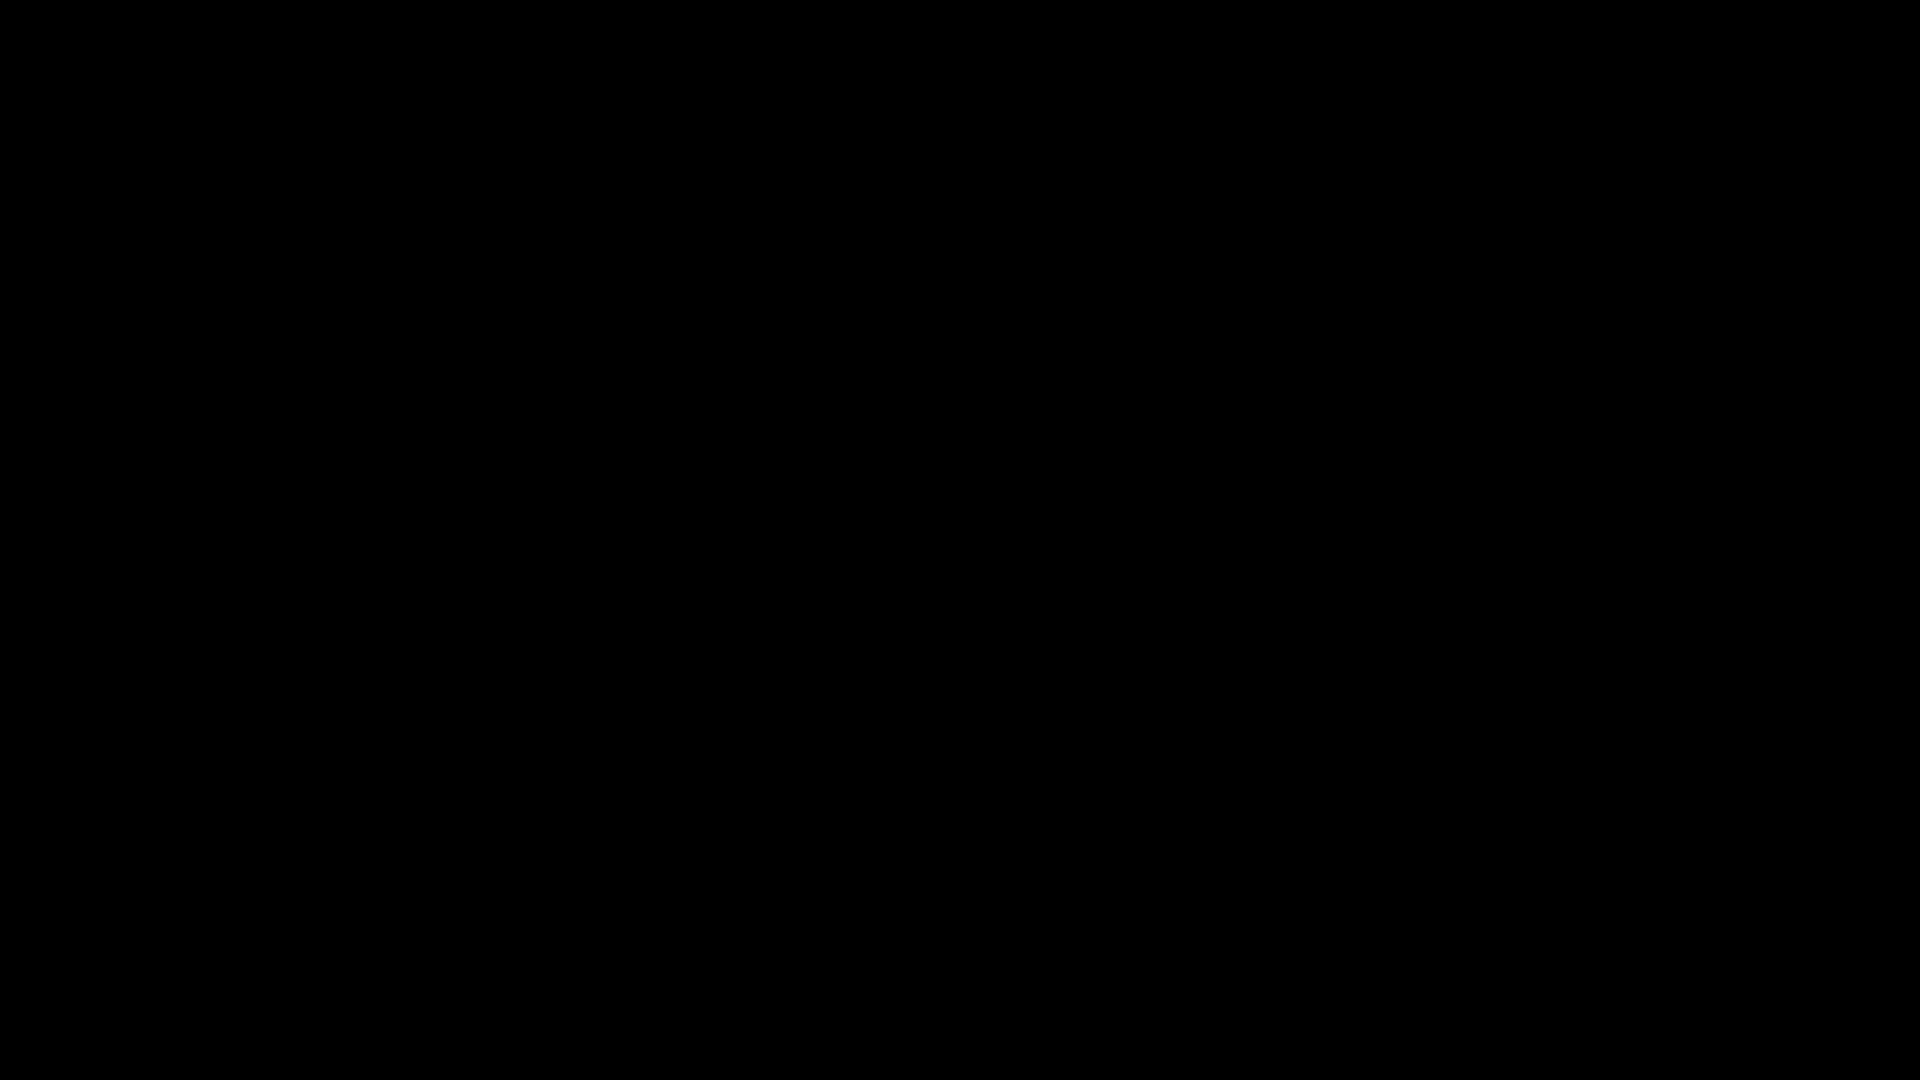 高画質露天女風呂観察 vol.032 女風呂 | OLのエロ生活  101連発 22